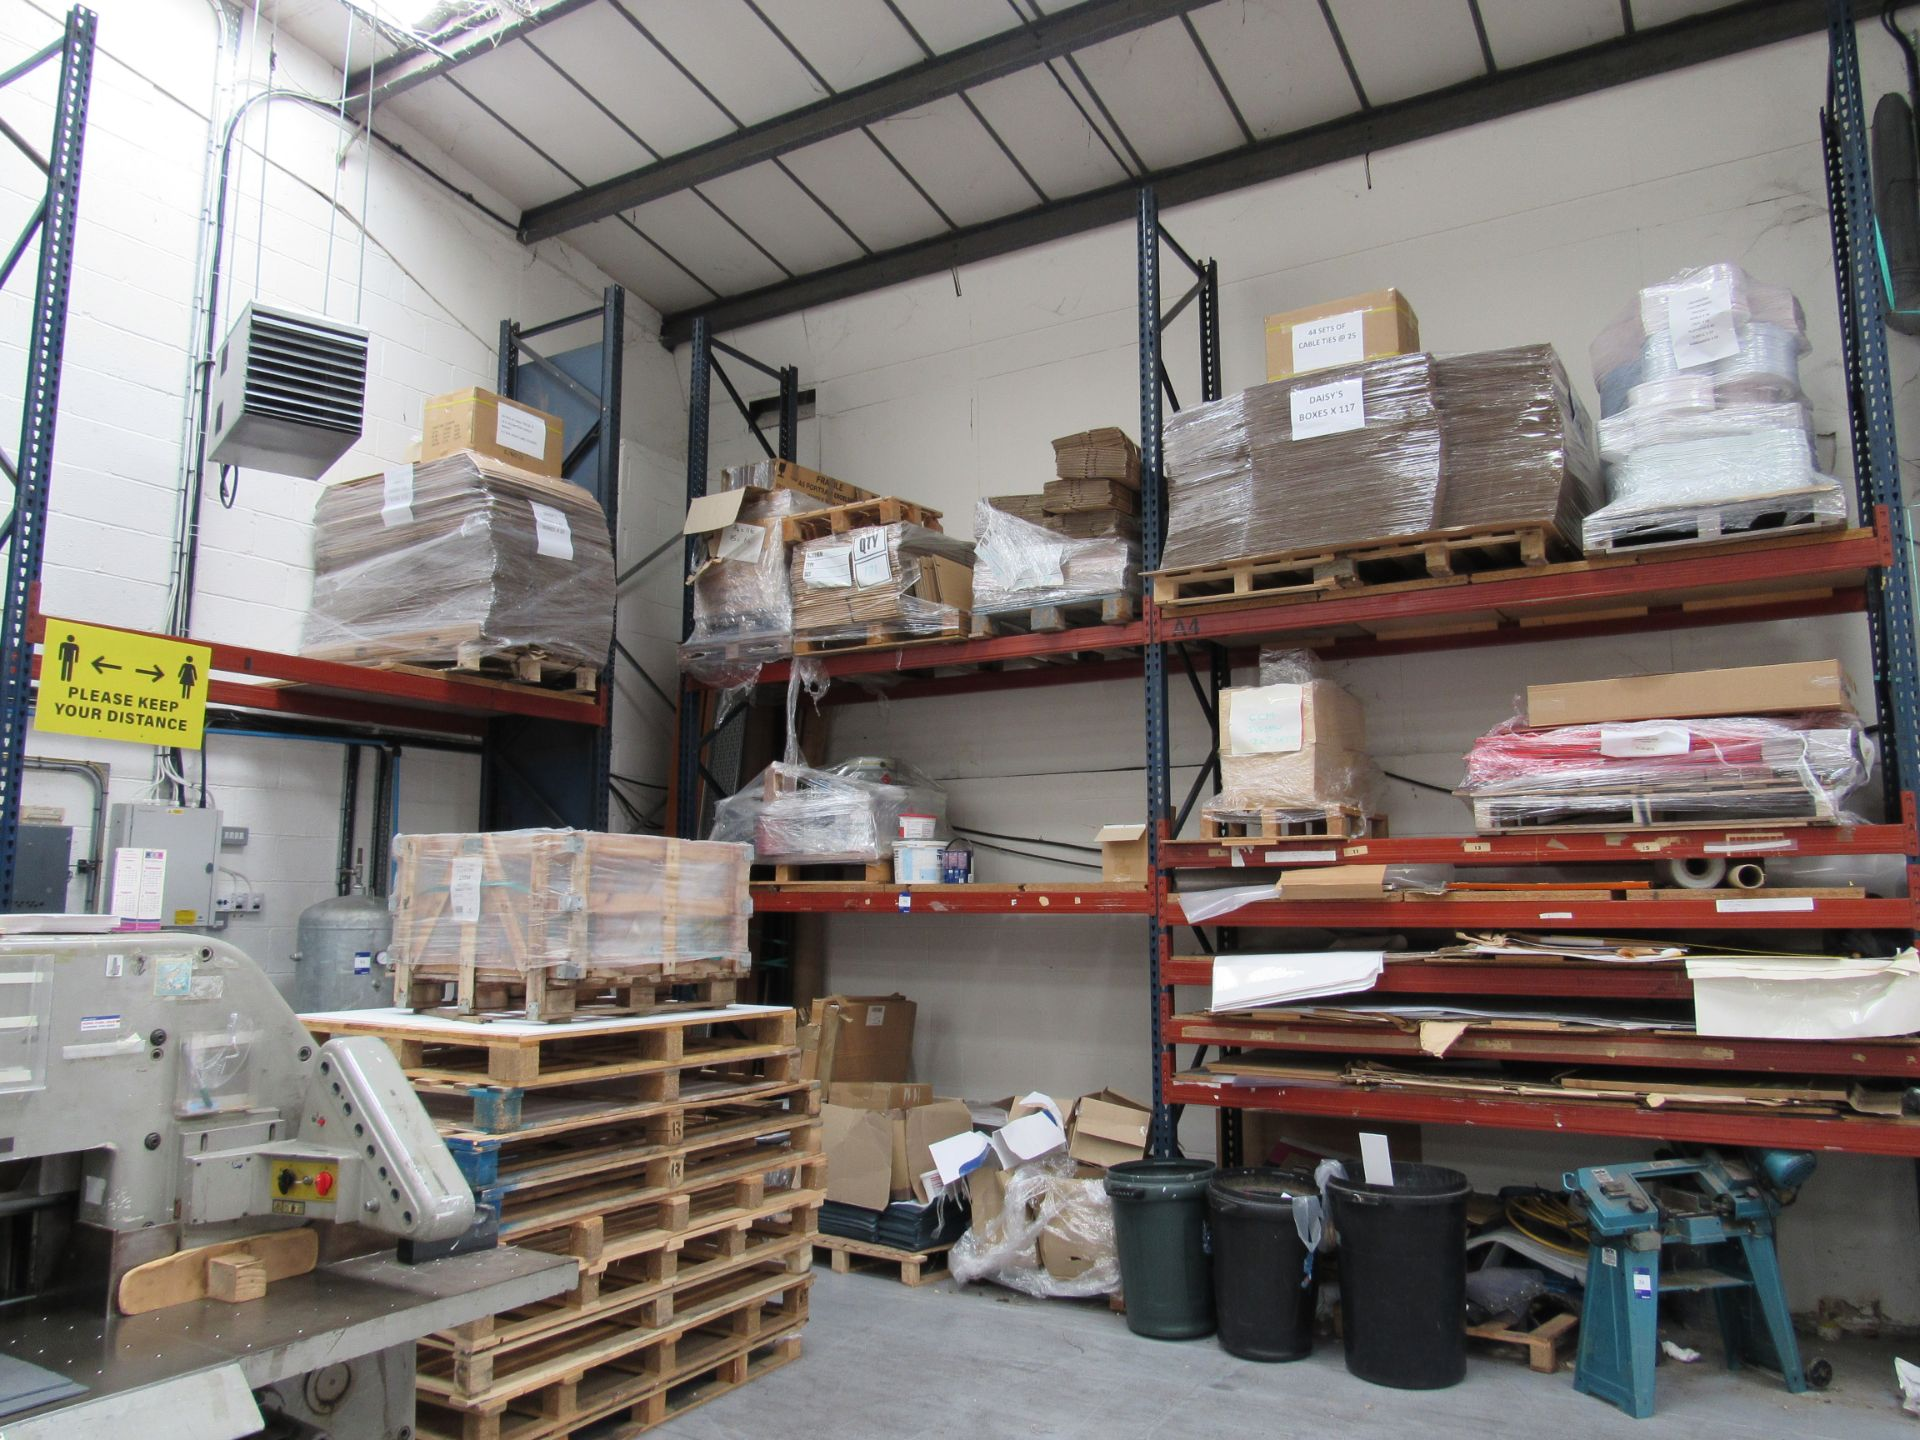 3 Bays Warehouse Racking, 5 End Frames, 20 Cross Beams